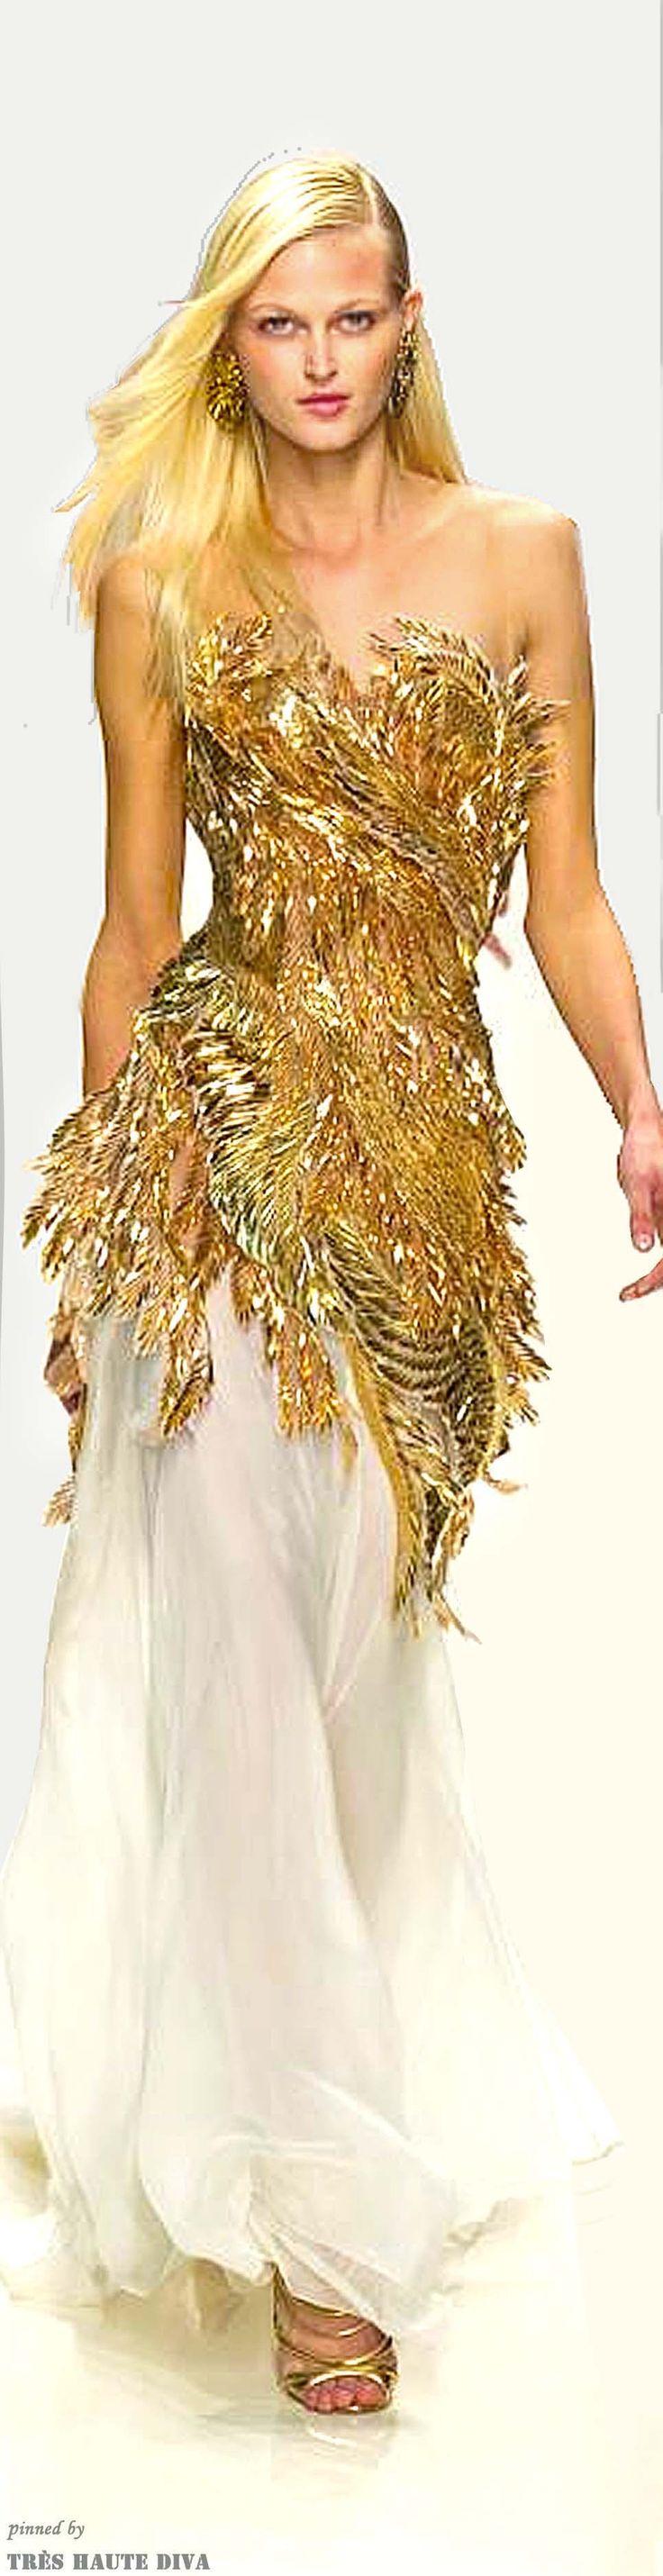 #Paris FW Valentin Yudashkin Spring 2014 Ready-to-Wear (The Gown Boutique)